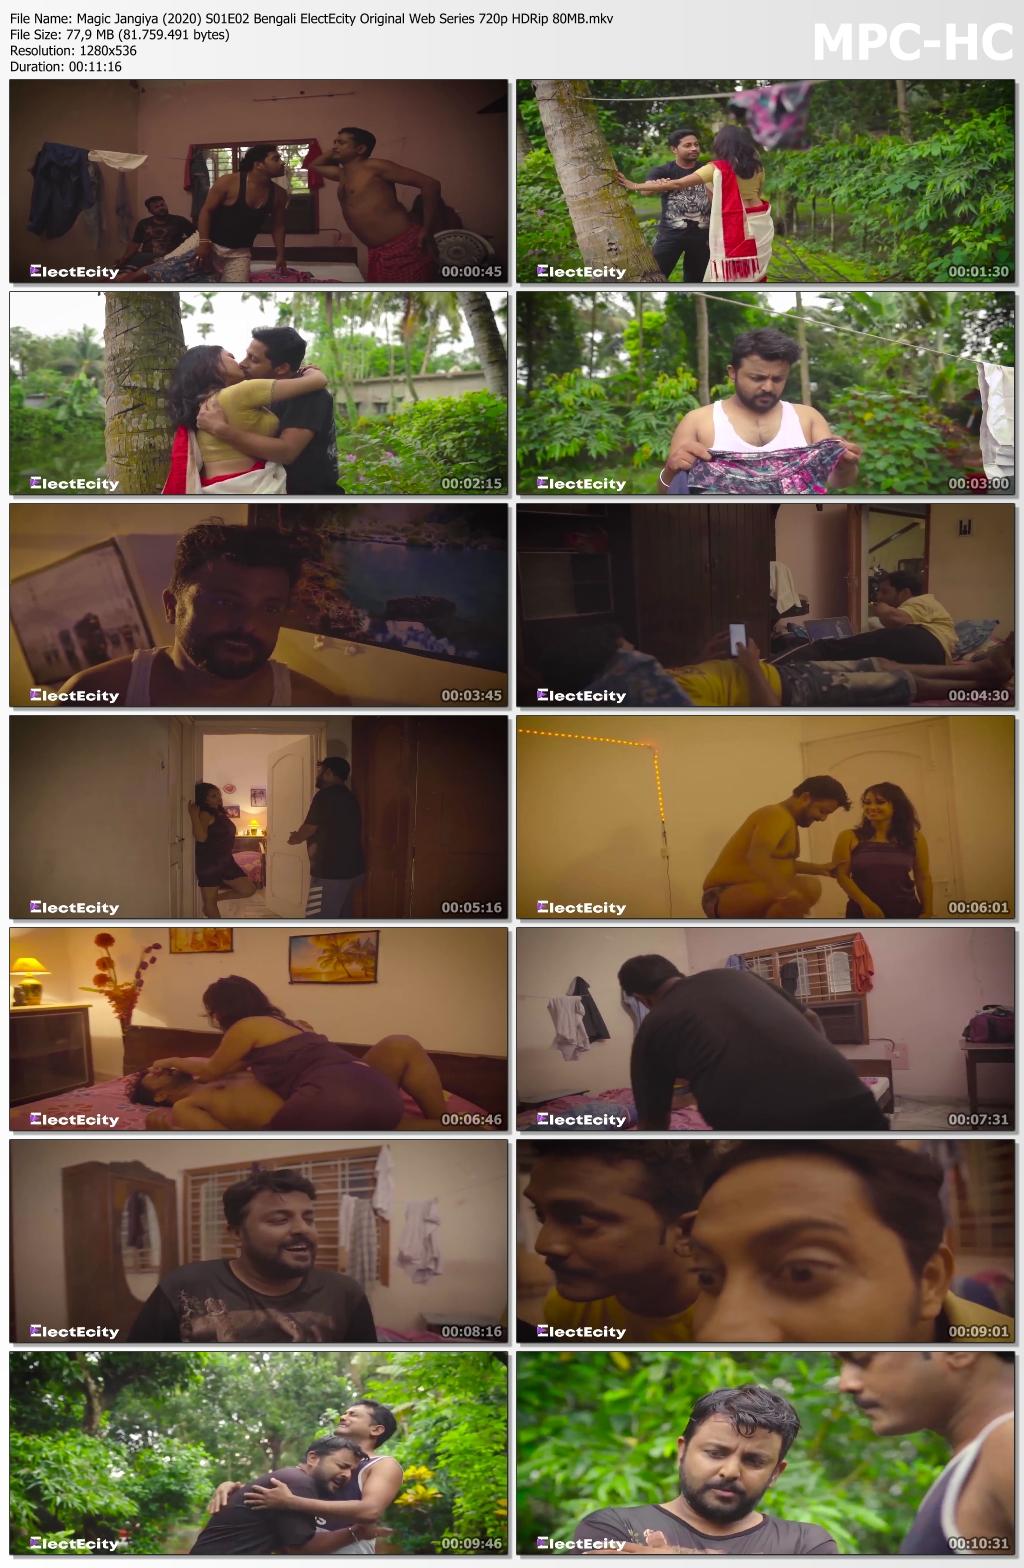 Magic-Jangiya-2020-S01-E02-Bengali-Elect-Ecity-Original-Web-Series-720p-HDRip-80-MB-mkv-thumbs